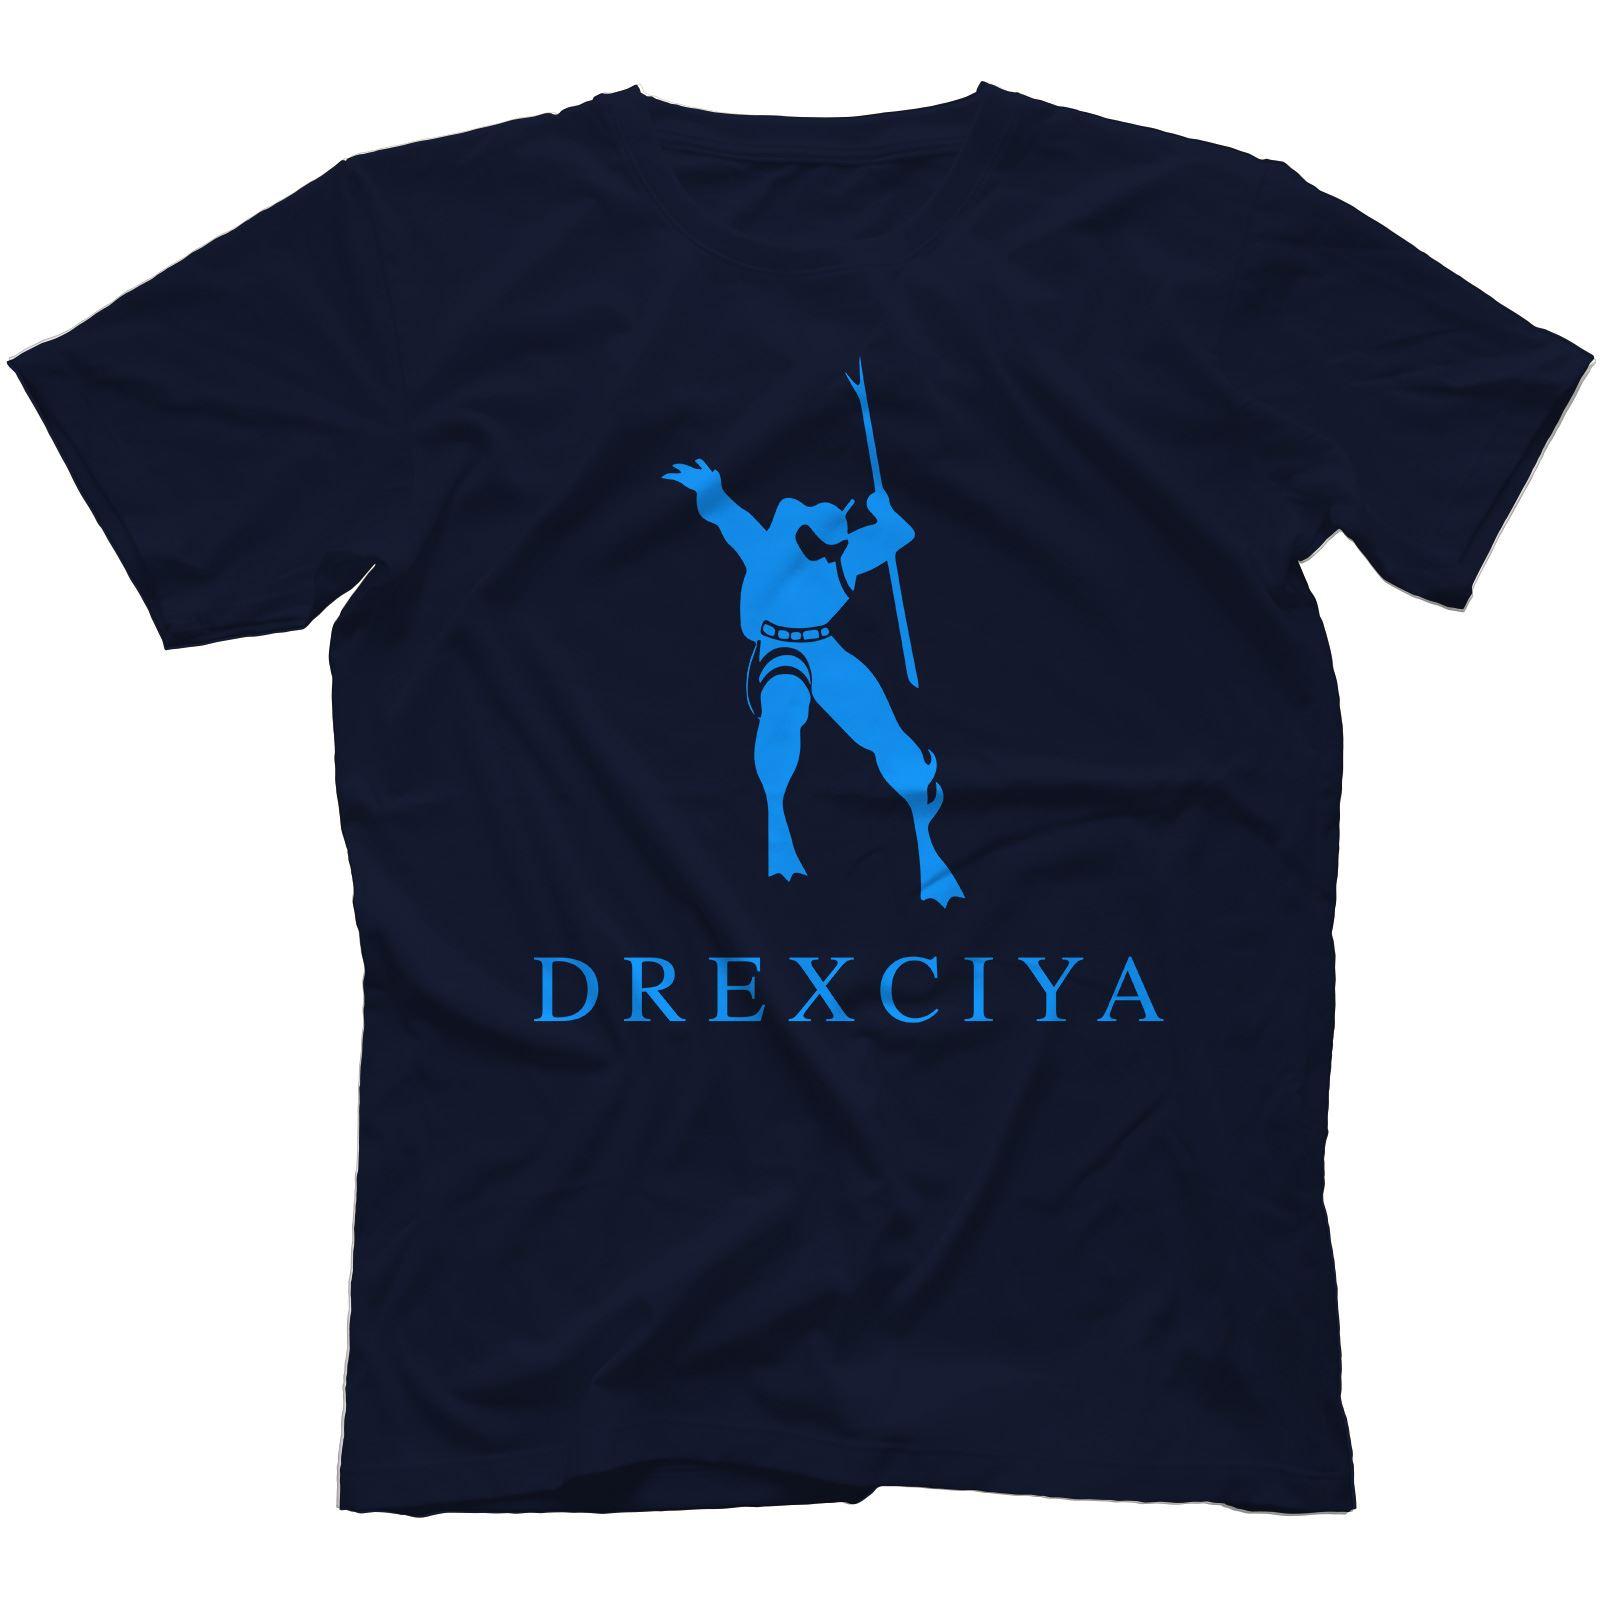 Drexciya-T-Shirt-100-Cotton-Detroit-Electro-Underground-Resistance-Aux-88